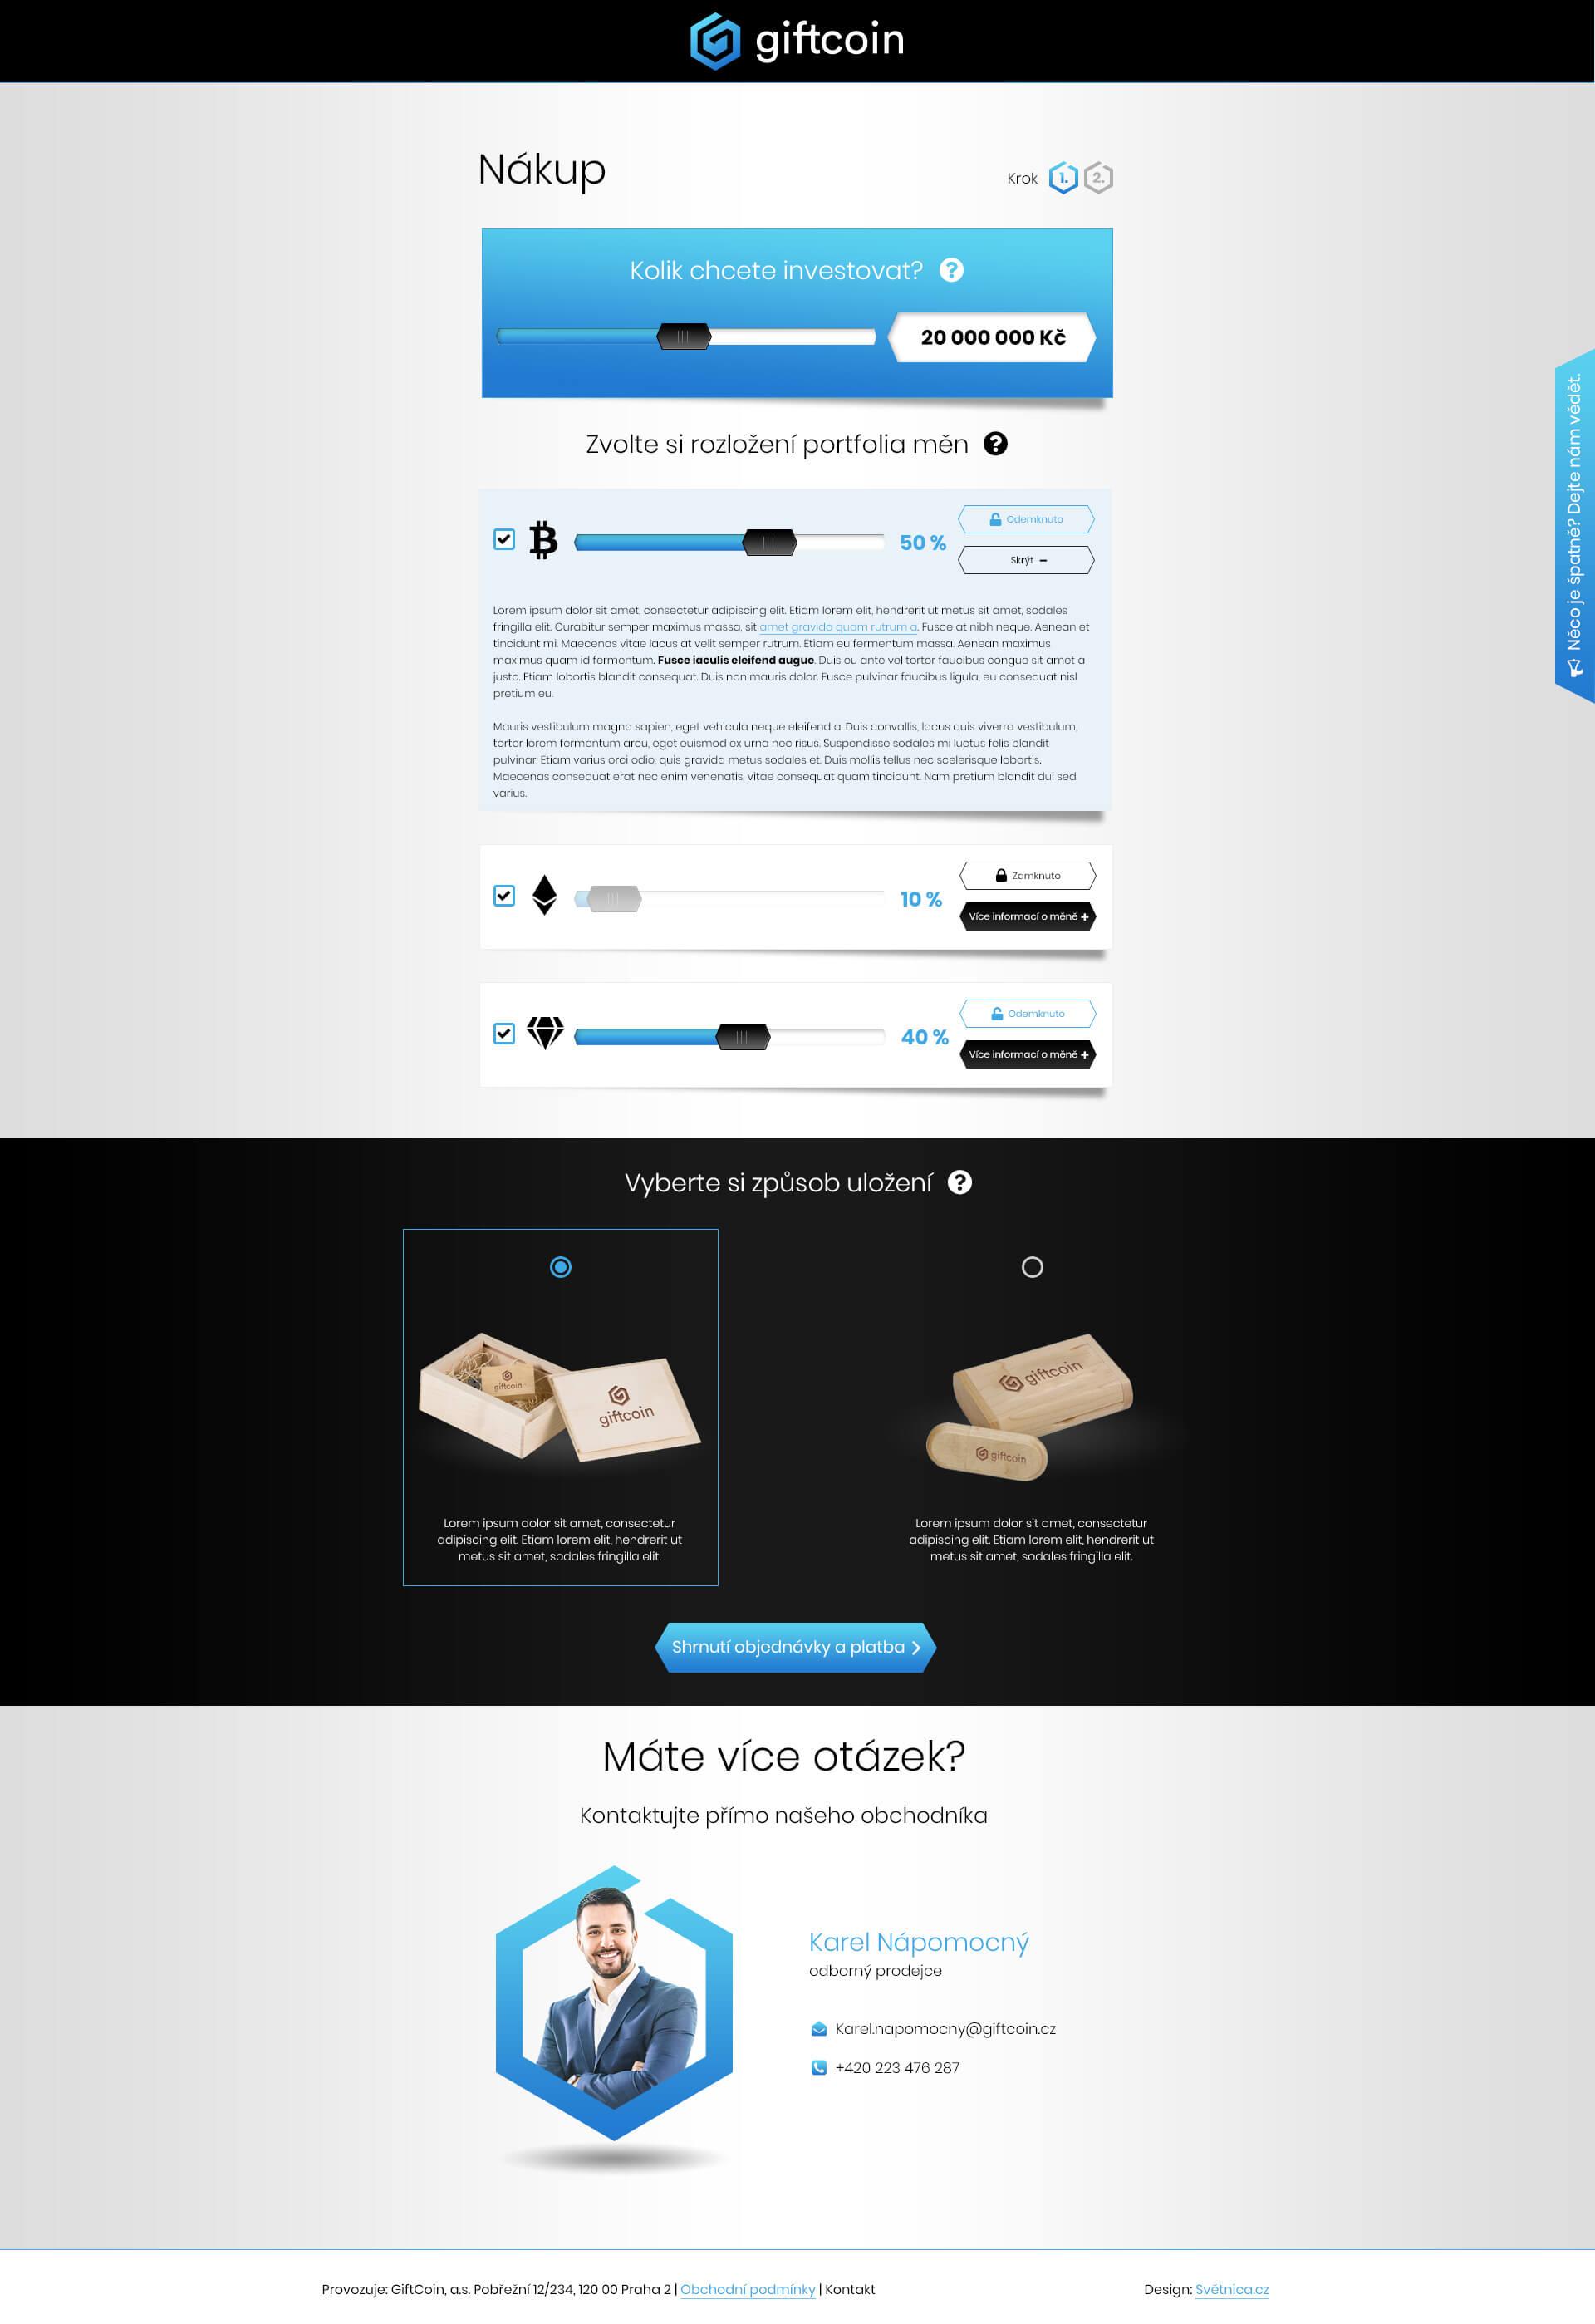 giftcoin-webdesign-svetnica-bily-krok-1